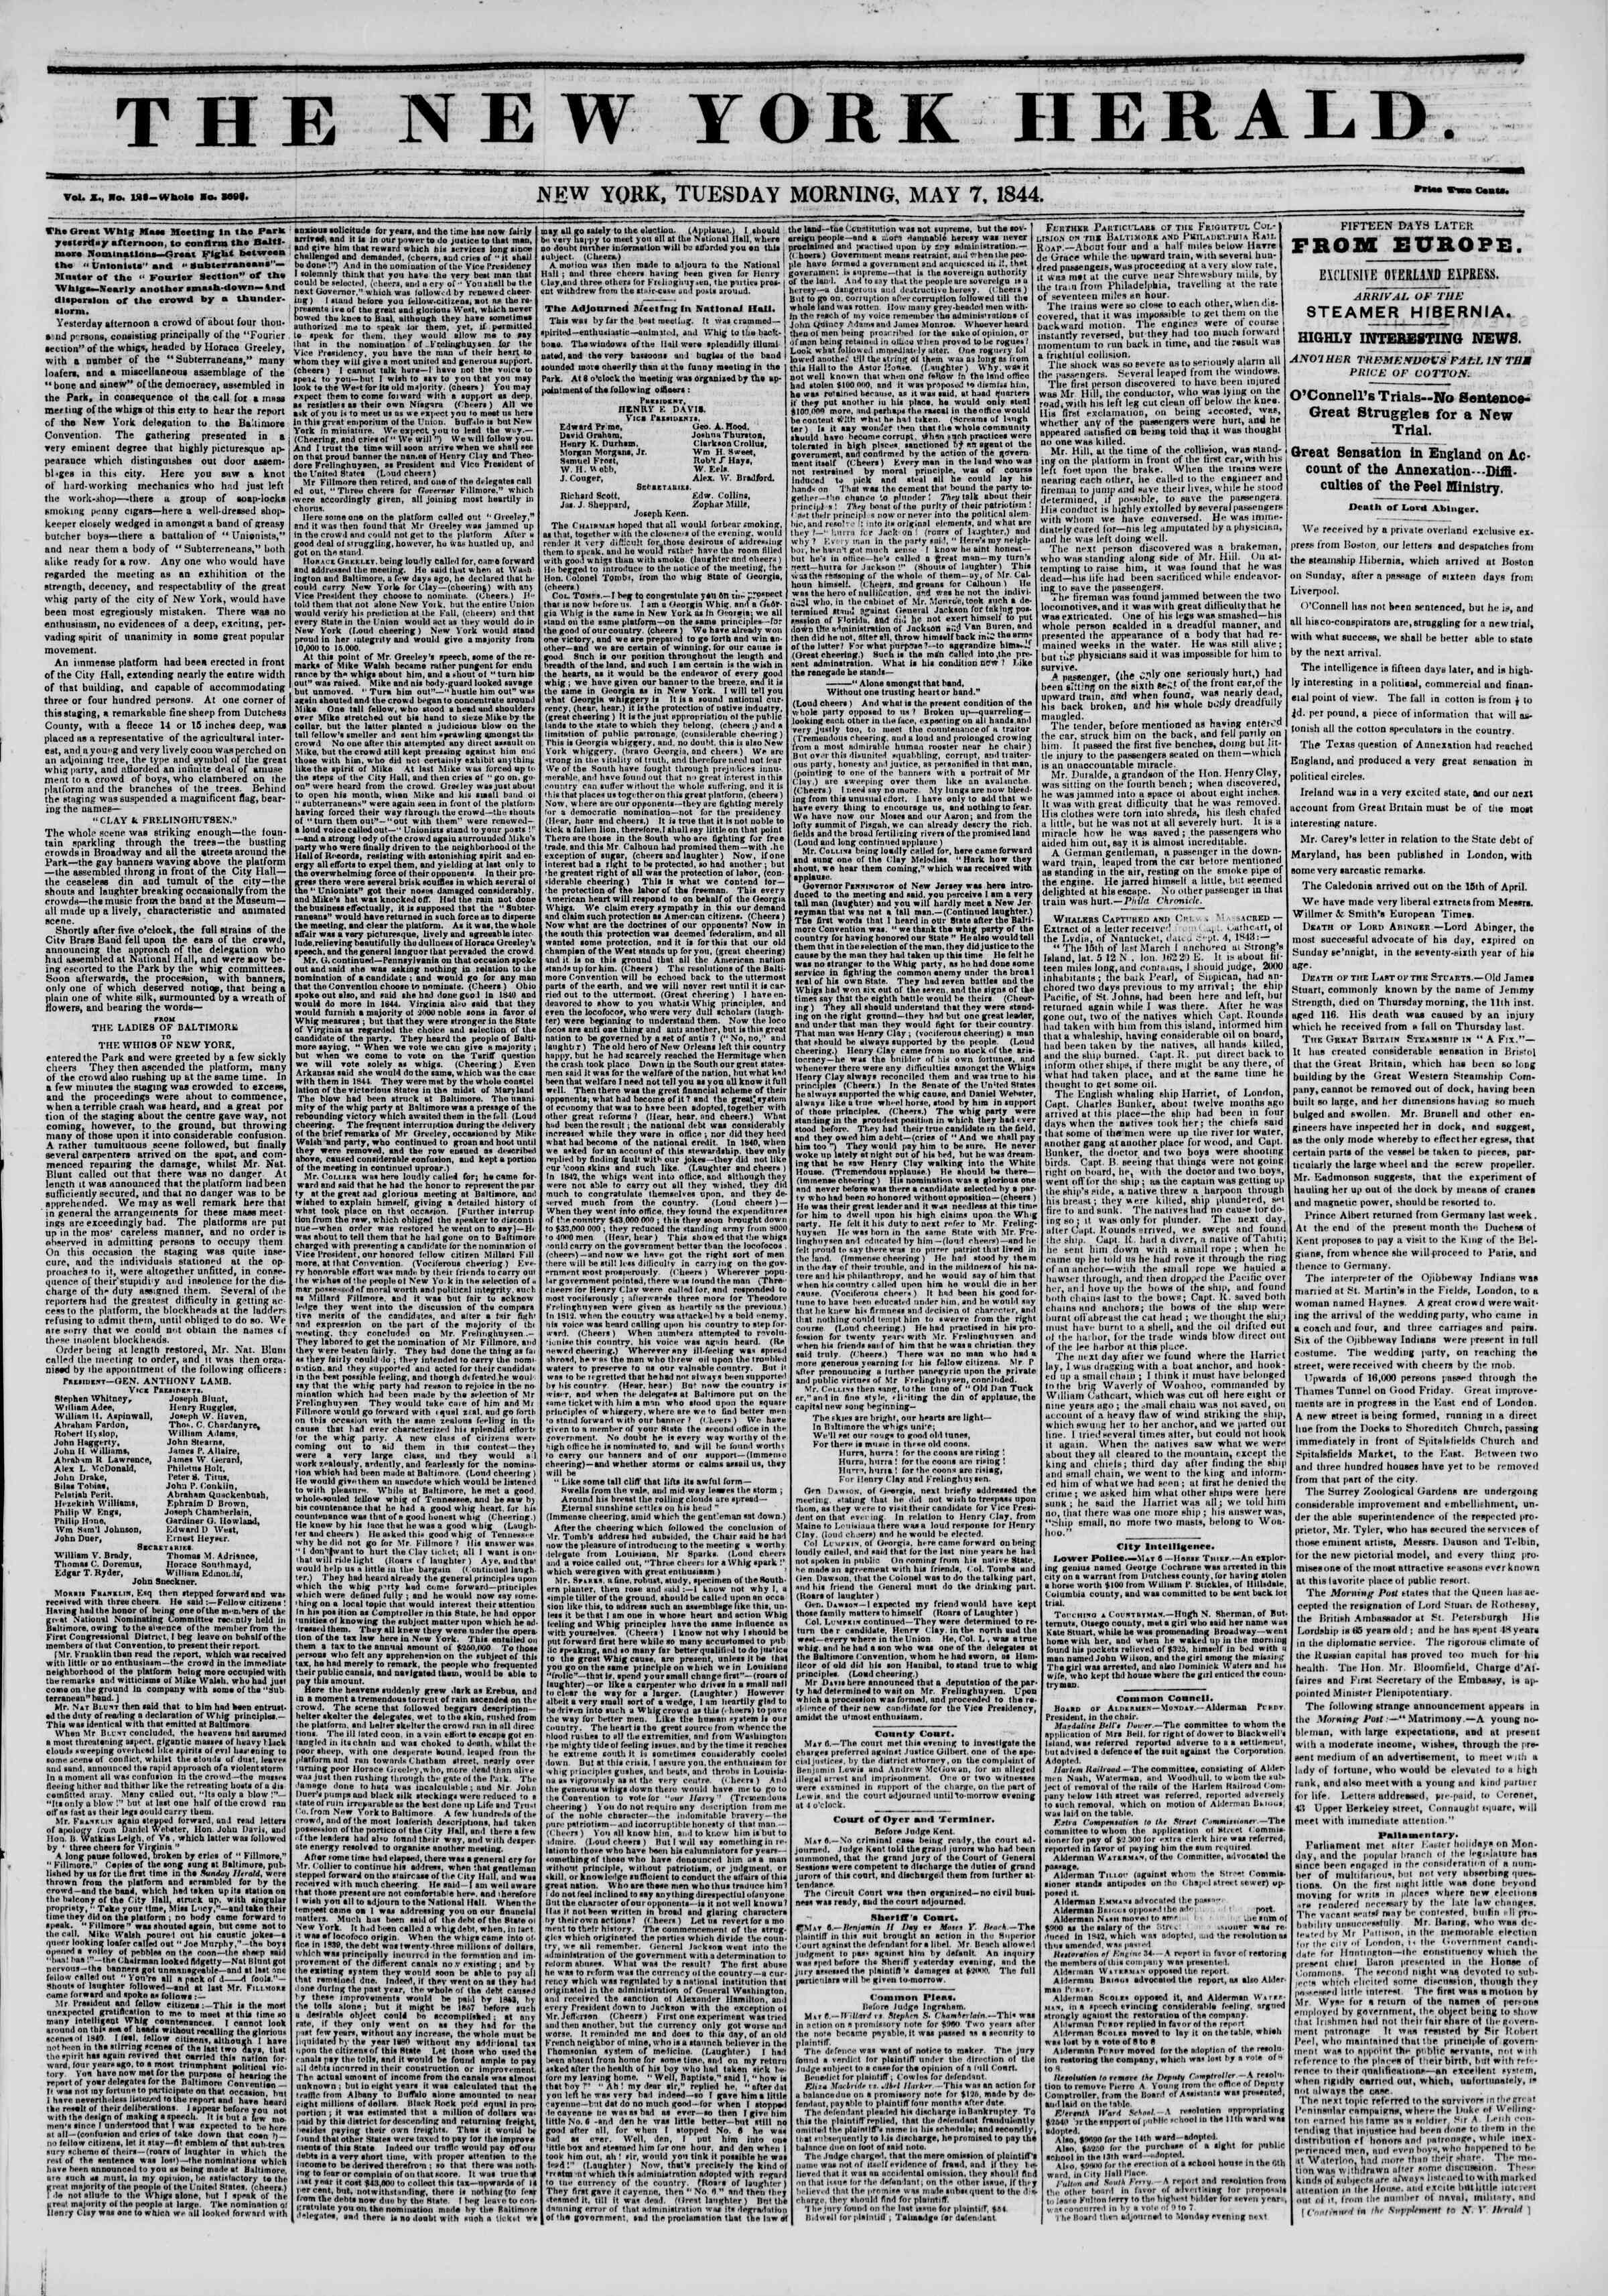 May 7, 1844 Tarihli The New York Herald Gazetesi Sayfa 1